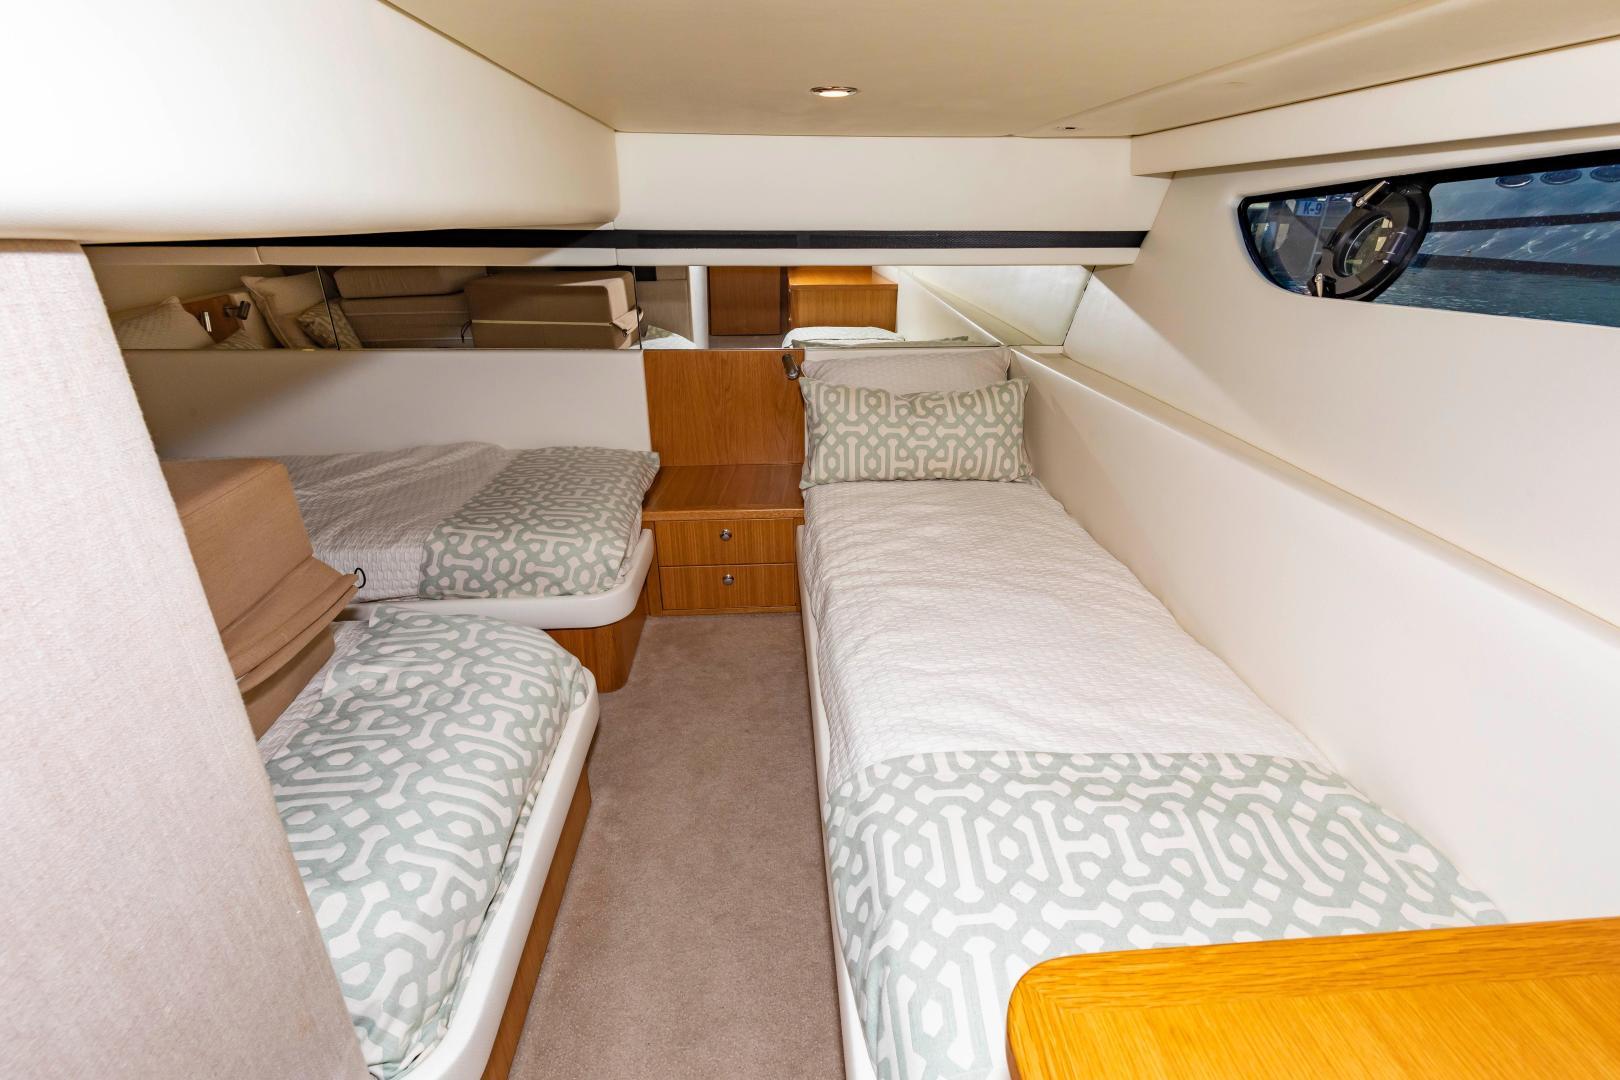 Riviera-395 SUV 2019-Ipanema Miami Beach-Florida-United States-1614915   Thumbnail